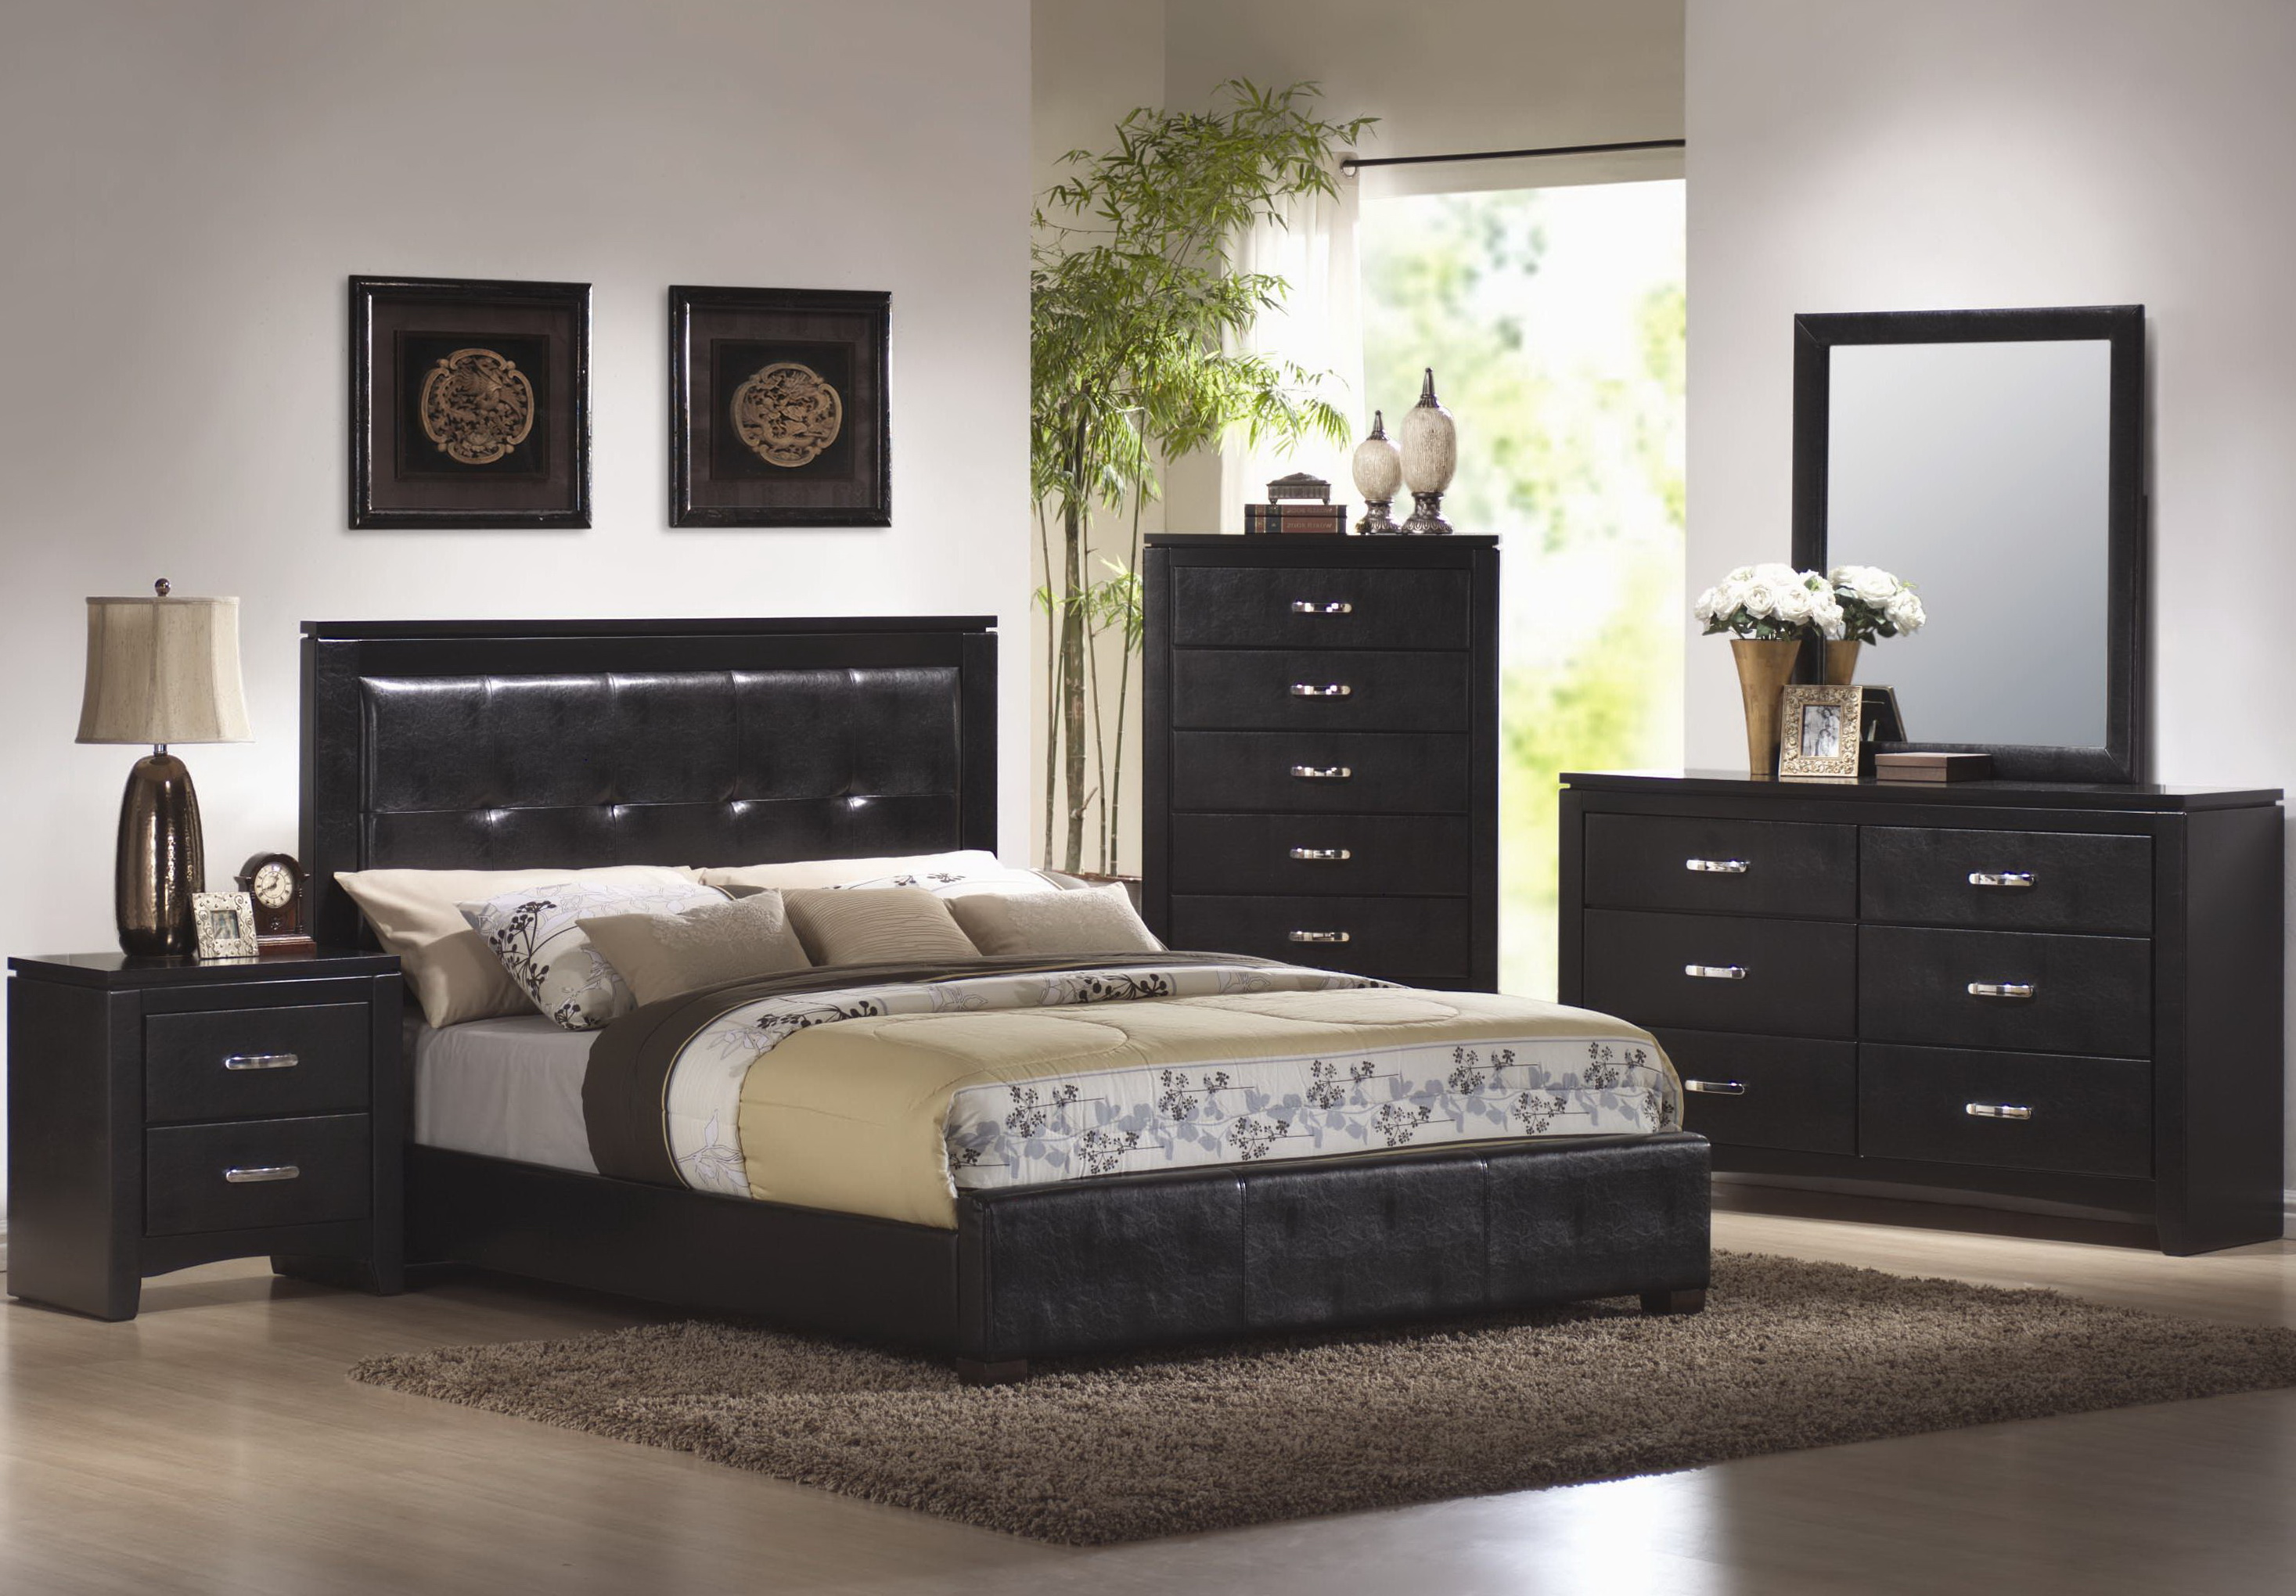 bedroom furniture black wood photo - 5